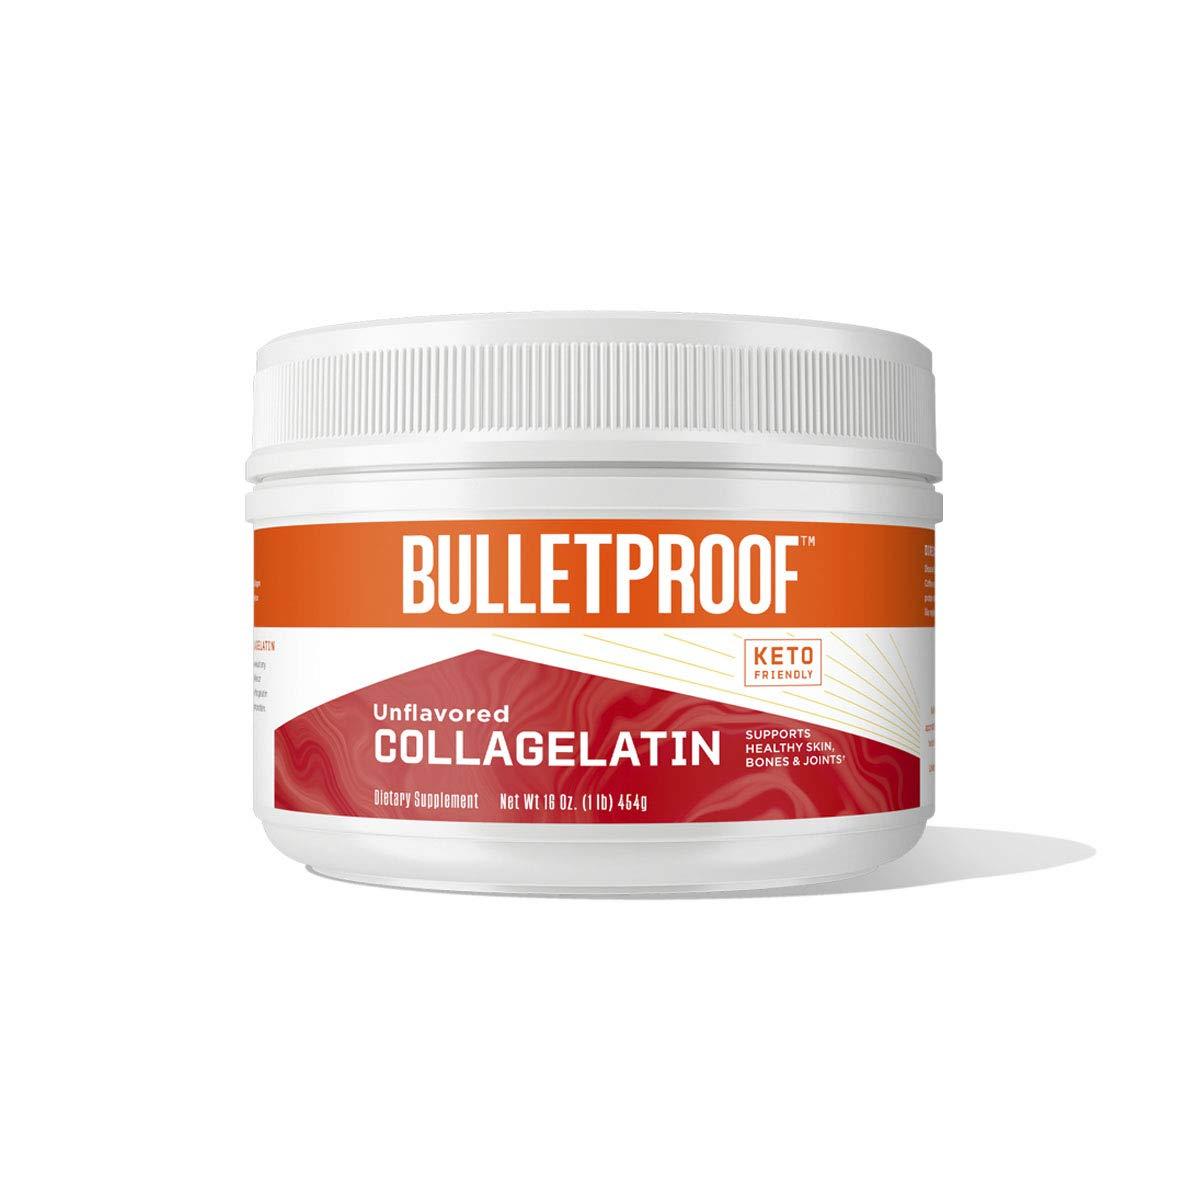 Unflavored CollaGelatin, 11g Protein, 16 Oz, Bulletproof Gelatin Enhanced with Collagen Protein Supports Skin, Bones and Joints